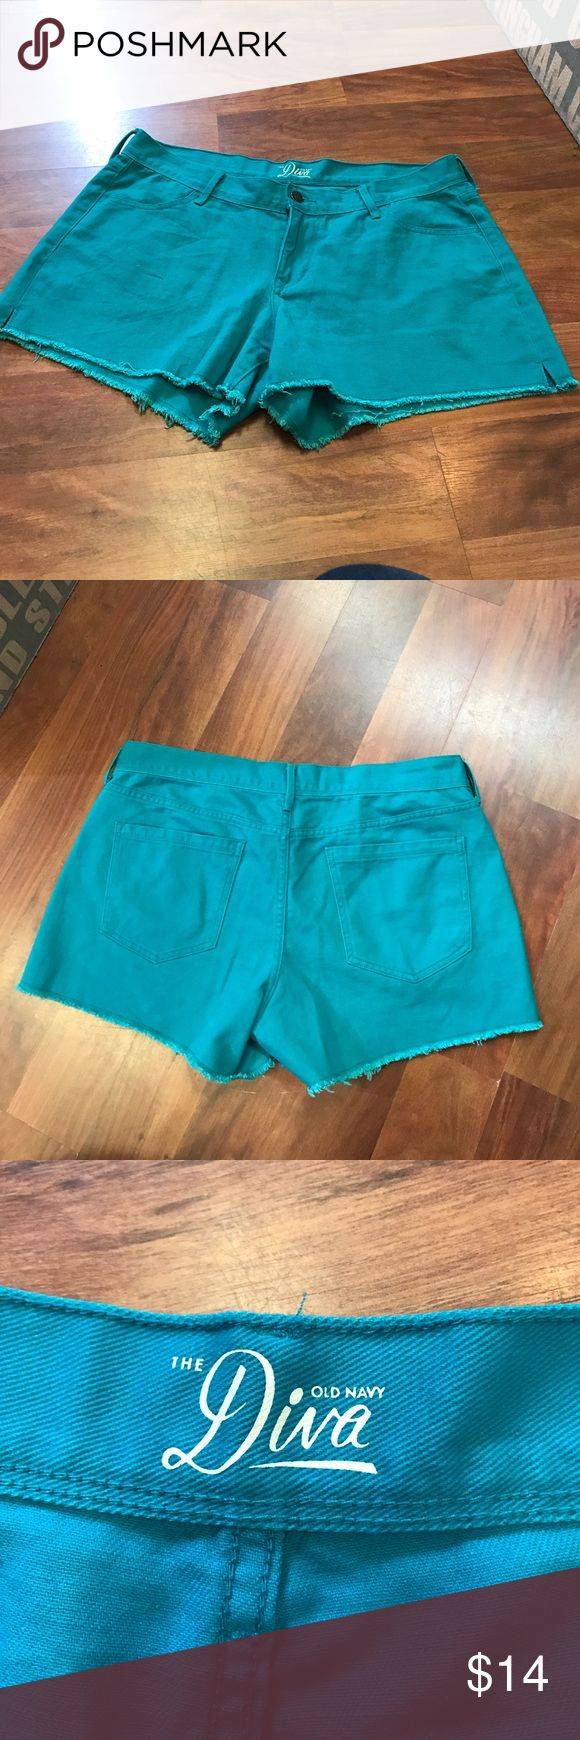 Old navy teal shorts sz 12 Old navy teal shorts sz 12 Old Navy Shorts